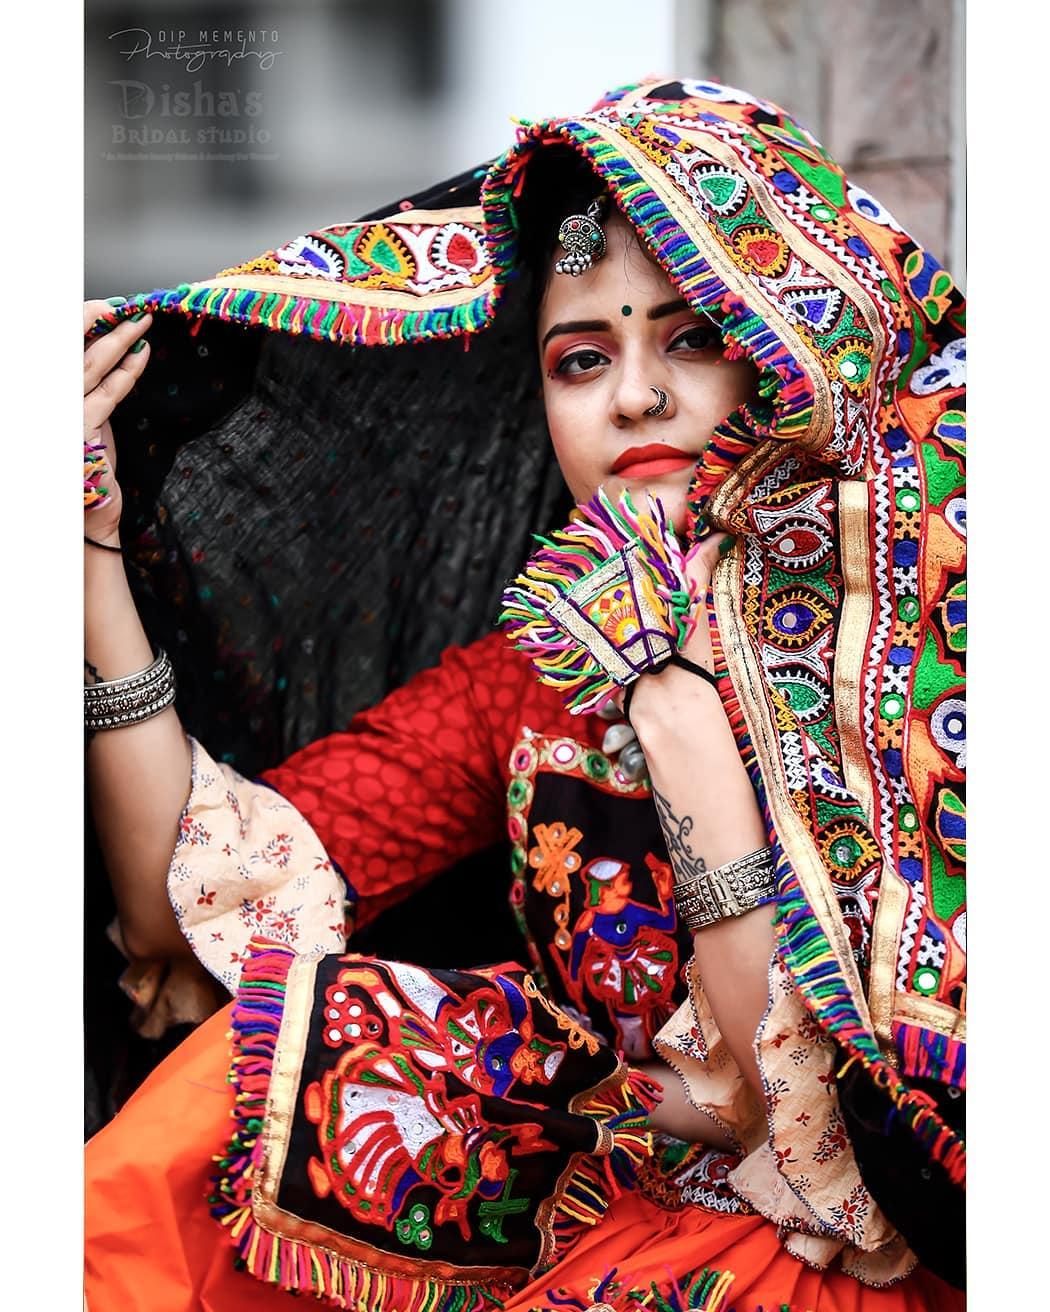 Dip Memento Photography,  navratri, photoshoot, ethnic, traditionalart, ahmedabad, gujarati, pop, makeup, navratrichaniyacholi, chaniyacholi, indianfashionblogger, fashionblogger, makeuptutorial, weddingdress, sexy#instagram, instapic, bollywood, bollywoodhotness, bollywoodactresses, indian, pic, picoftheday, photooftheday, instagood#instamood, festivalofnations, festival